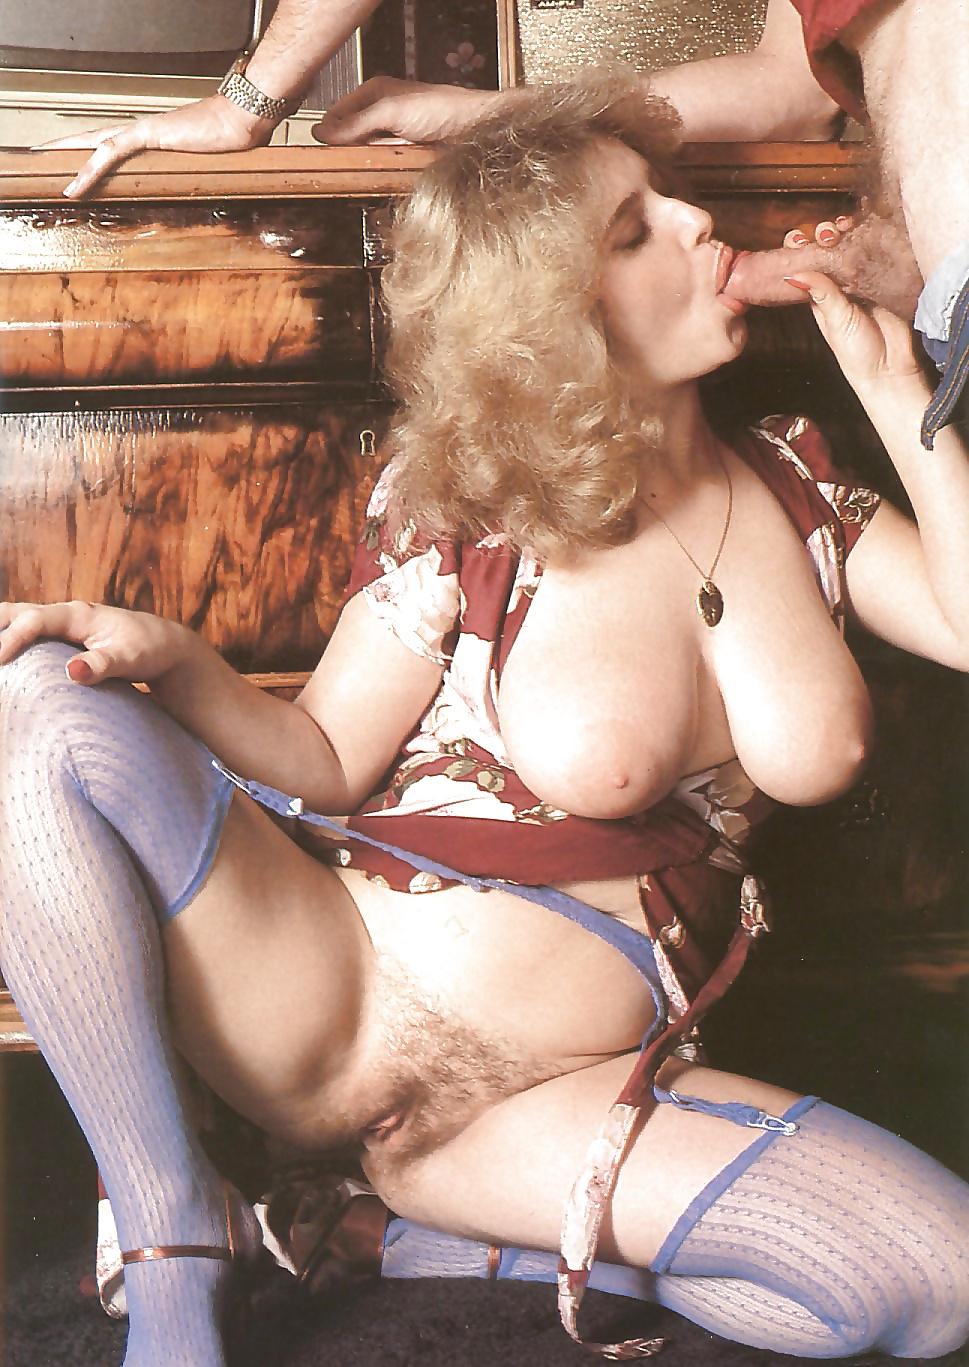 retro-bbw-anal-tubes-britney-spears-nude-sex-fake